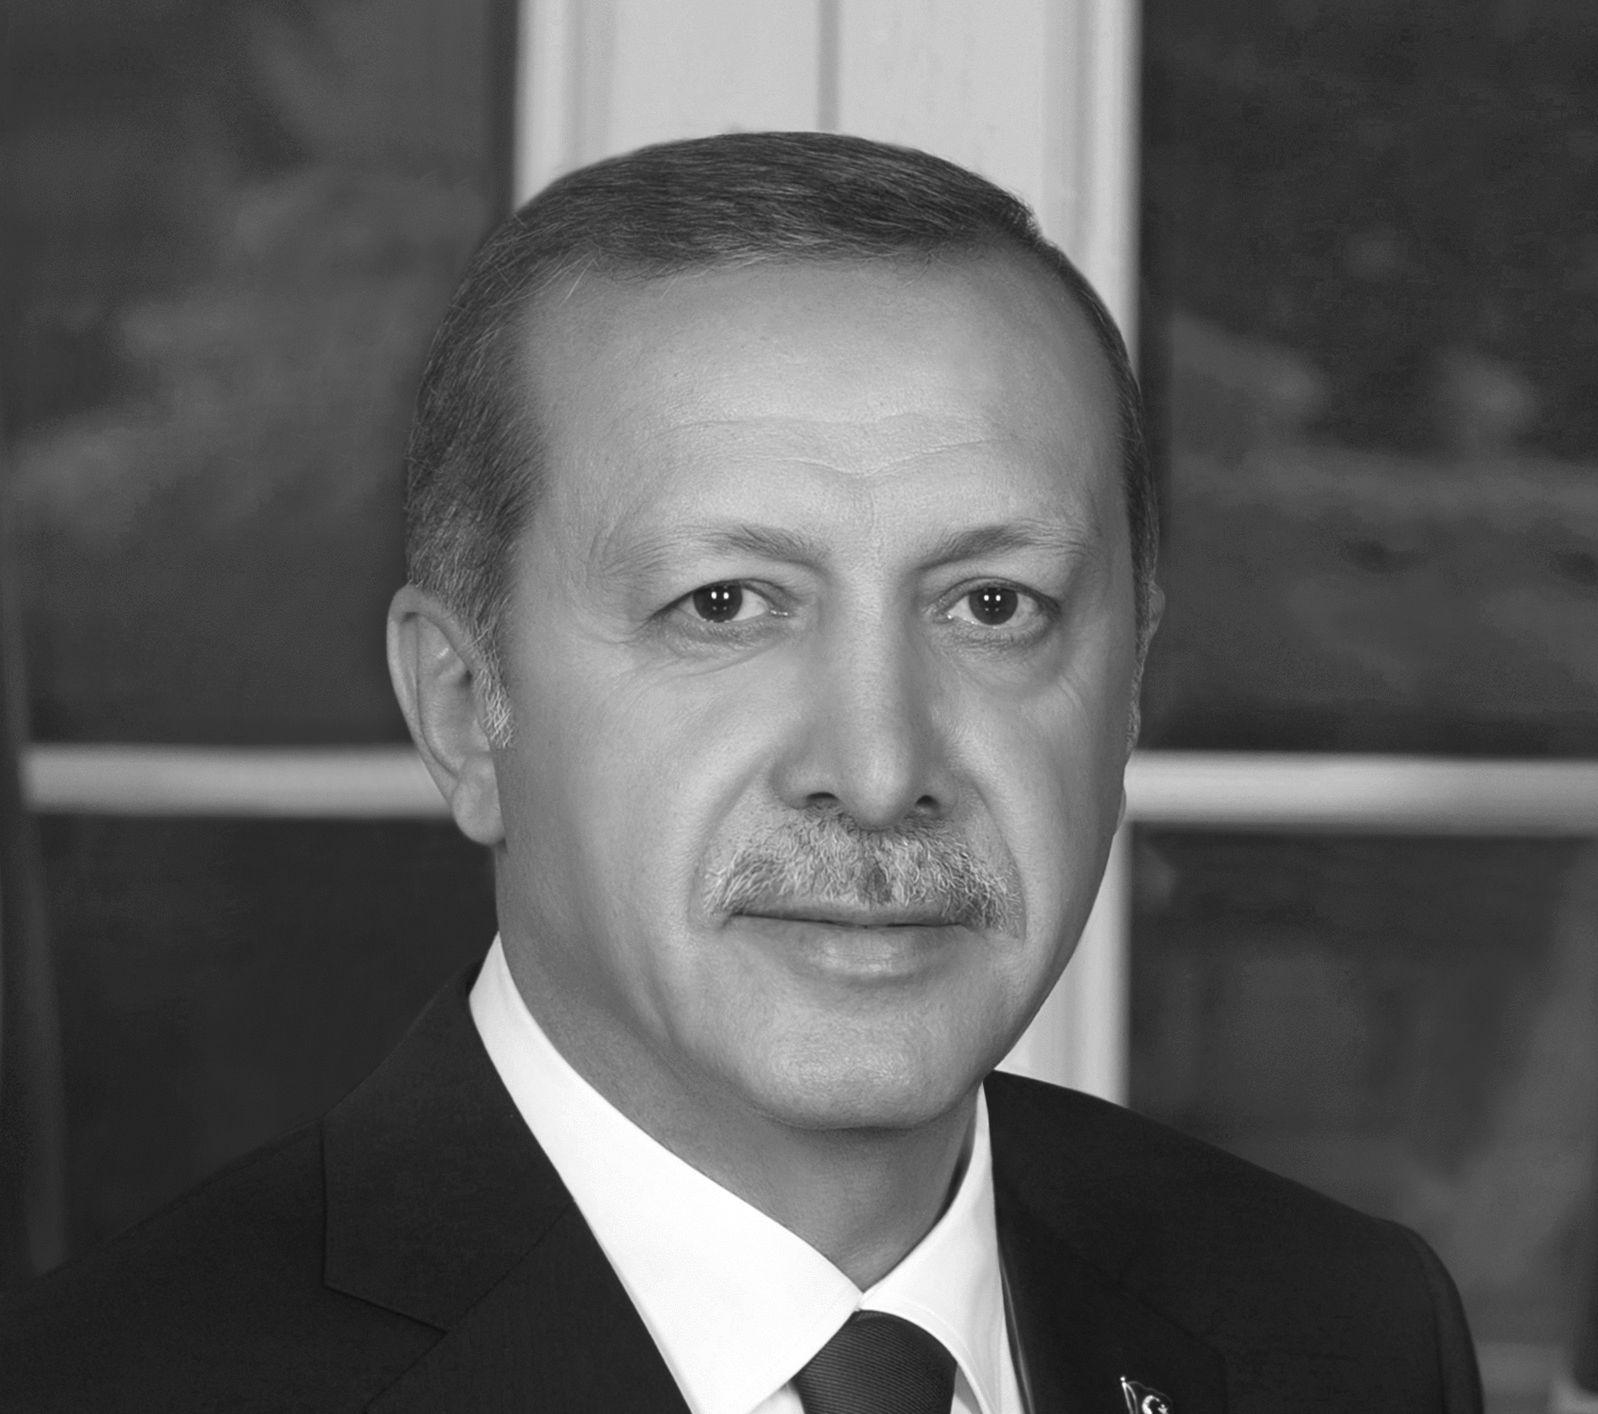 Recep Tayyip Erdogan Headshot